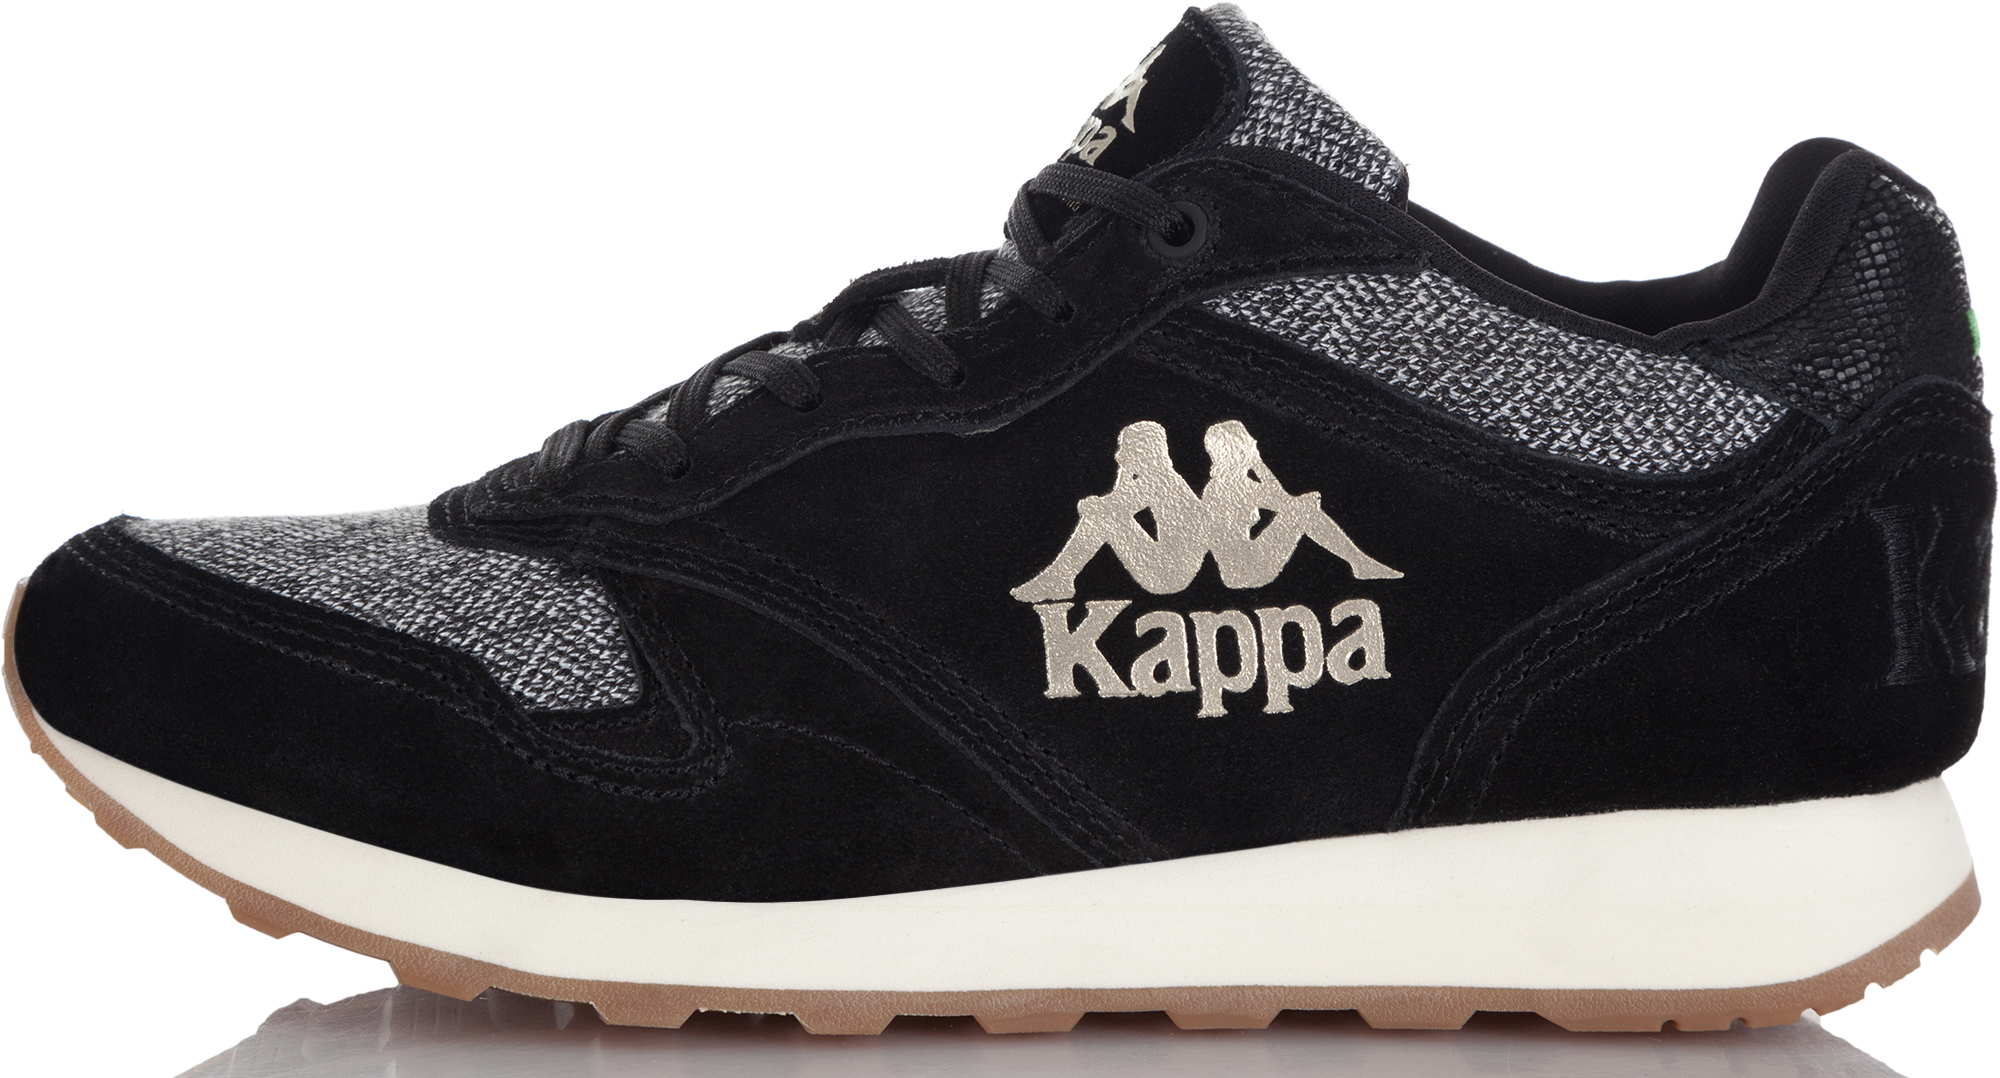 Kappa Кроссовки женские Kappa Authentic Run, размер 41 kappa кроссовки женские kappa linea